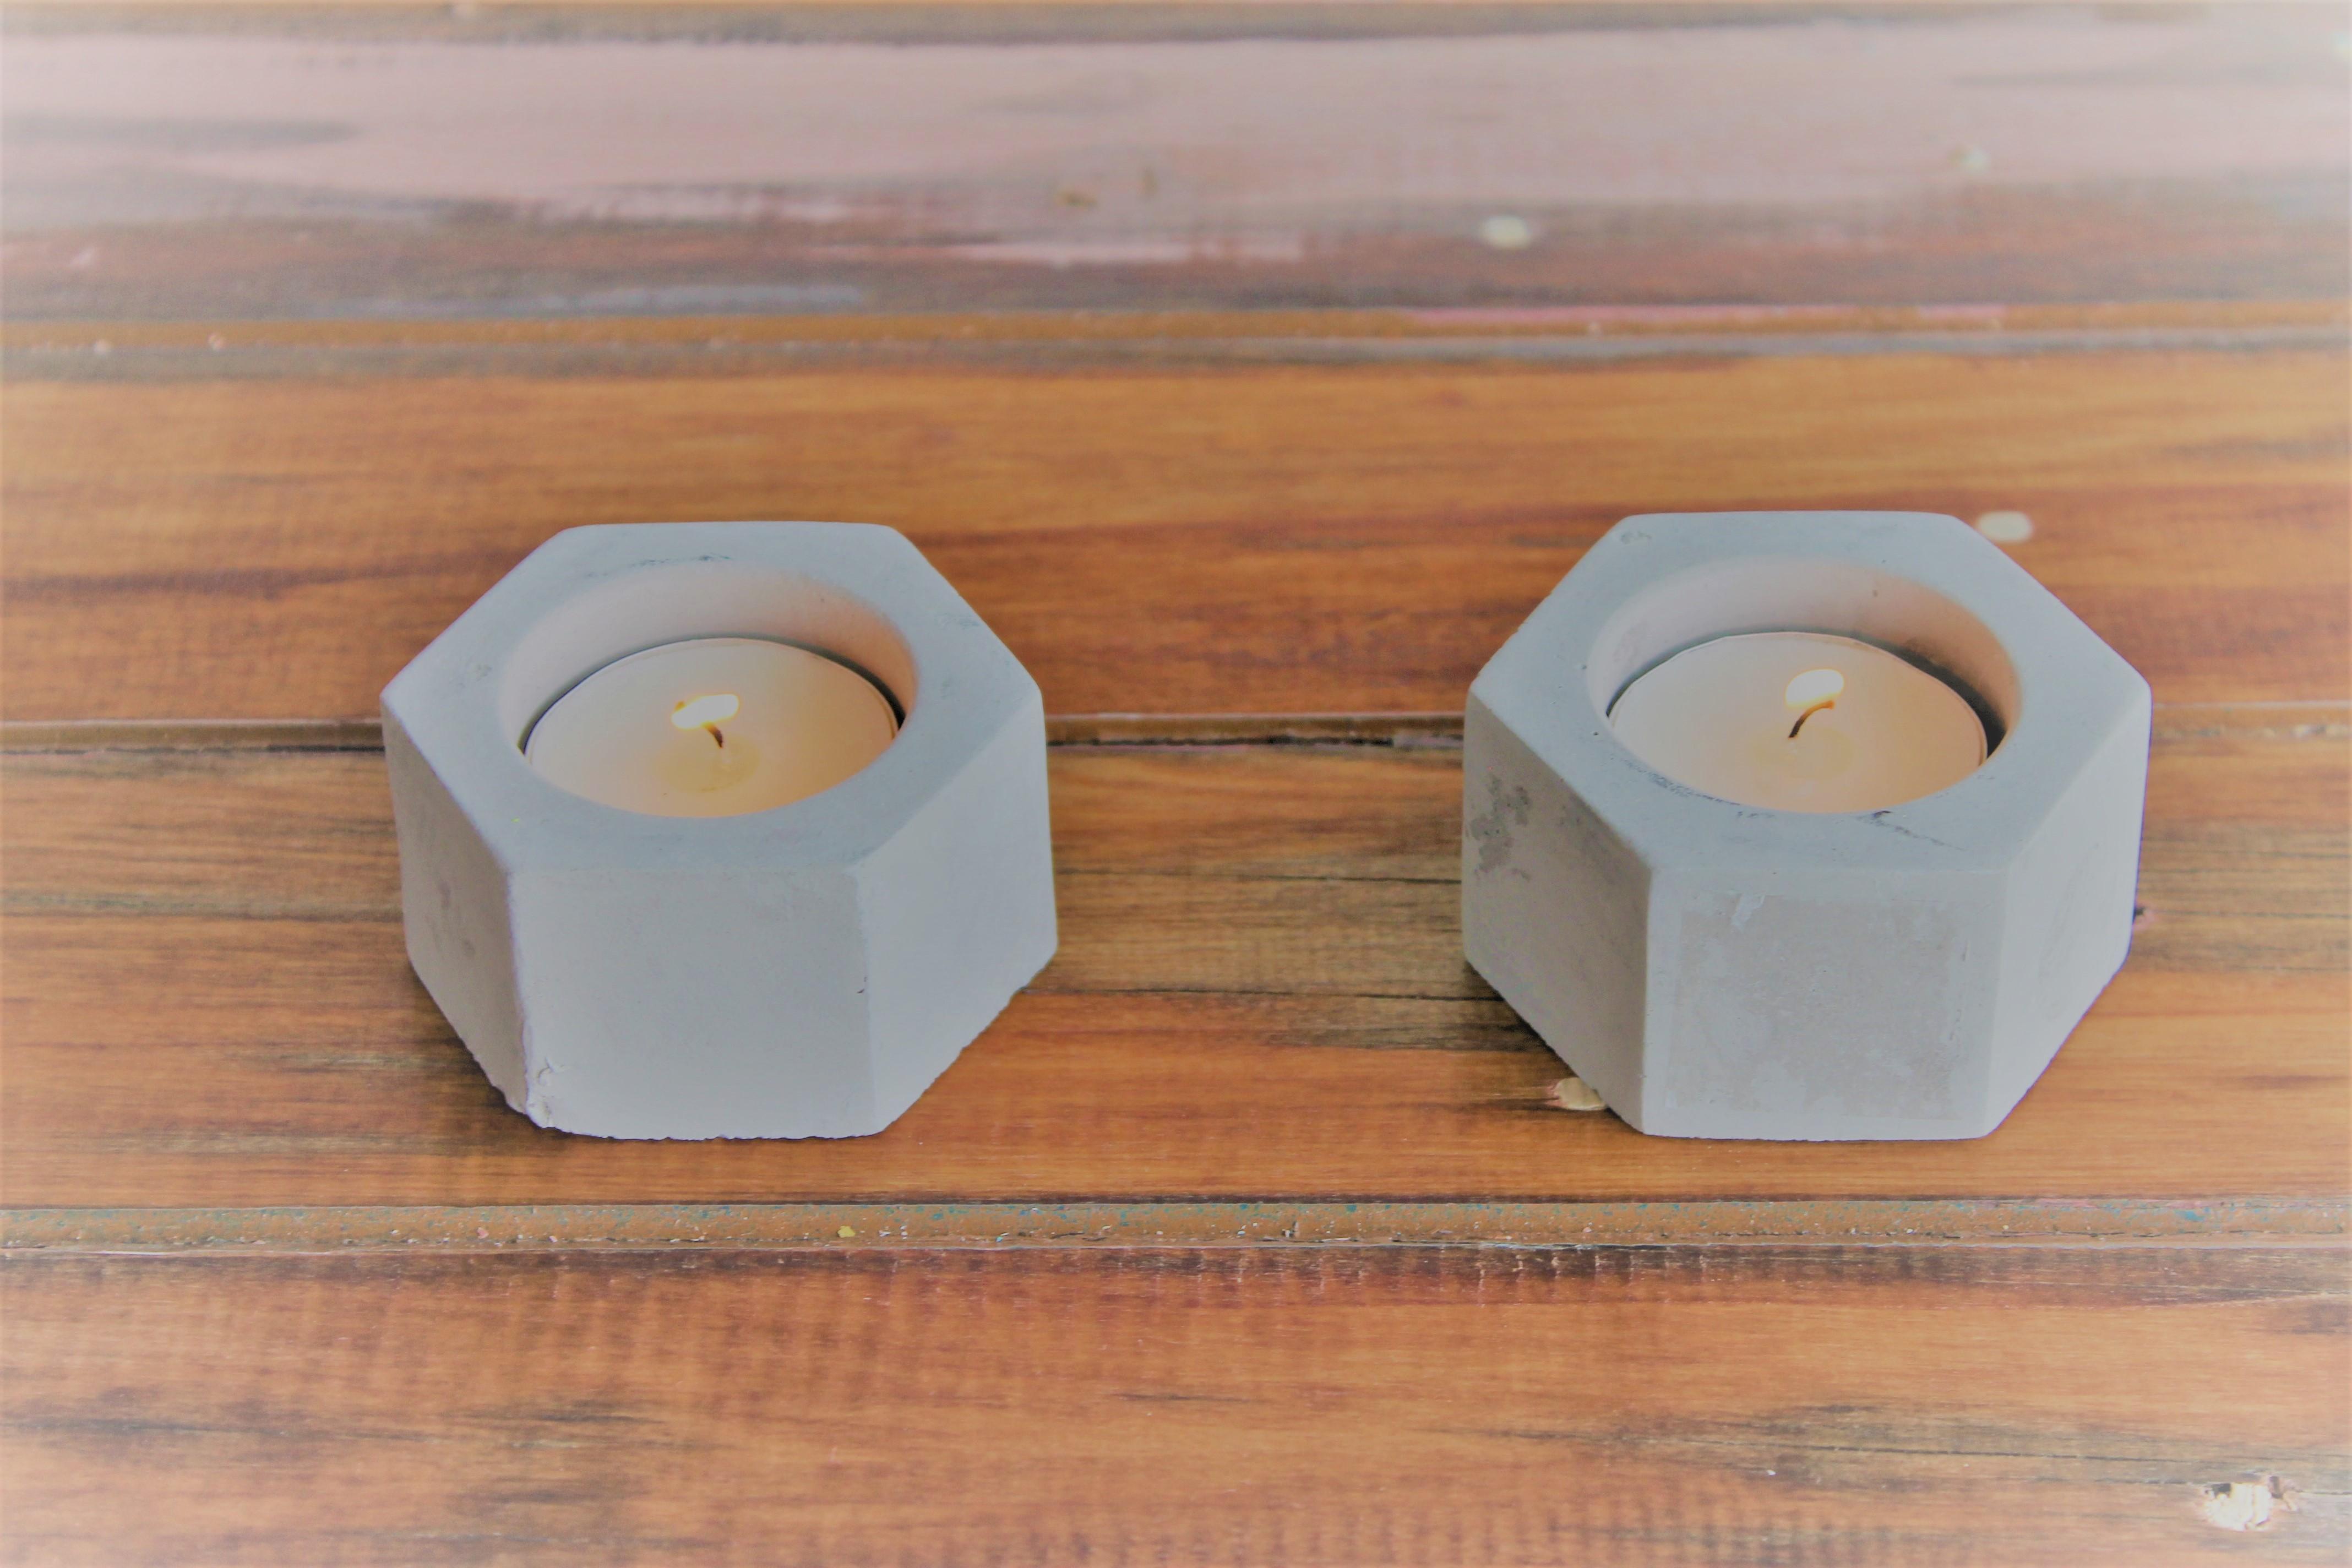 Concrete Hexagon T/Light Holders